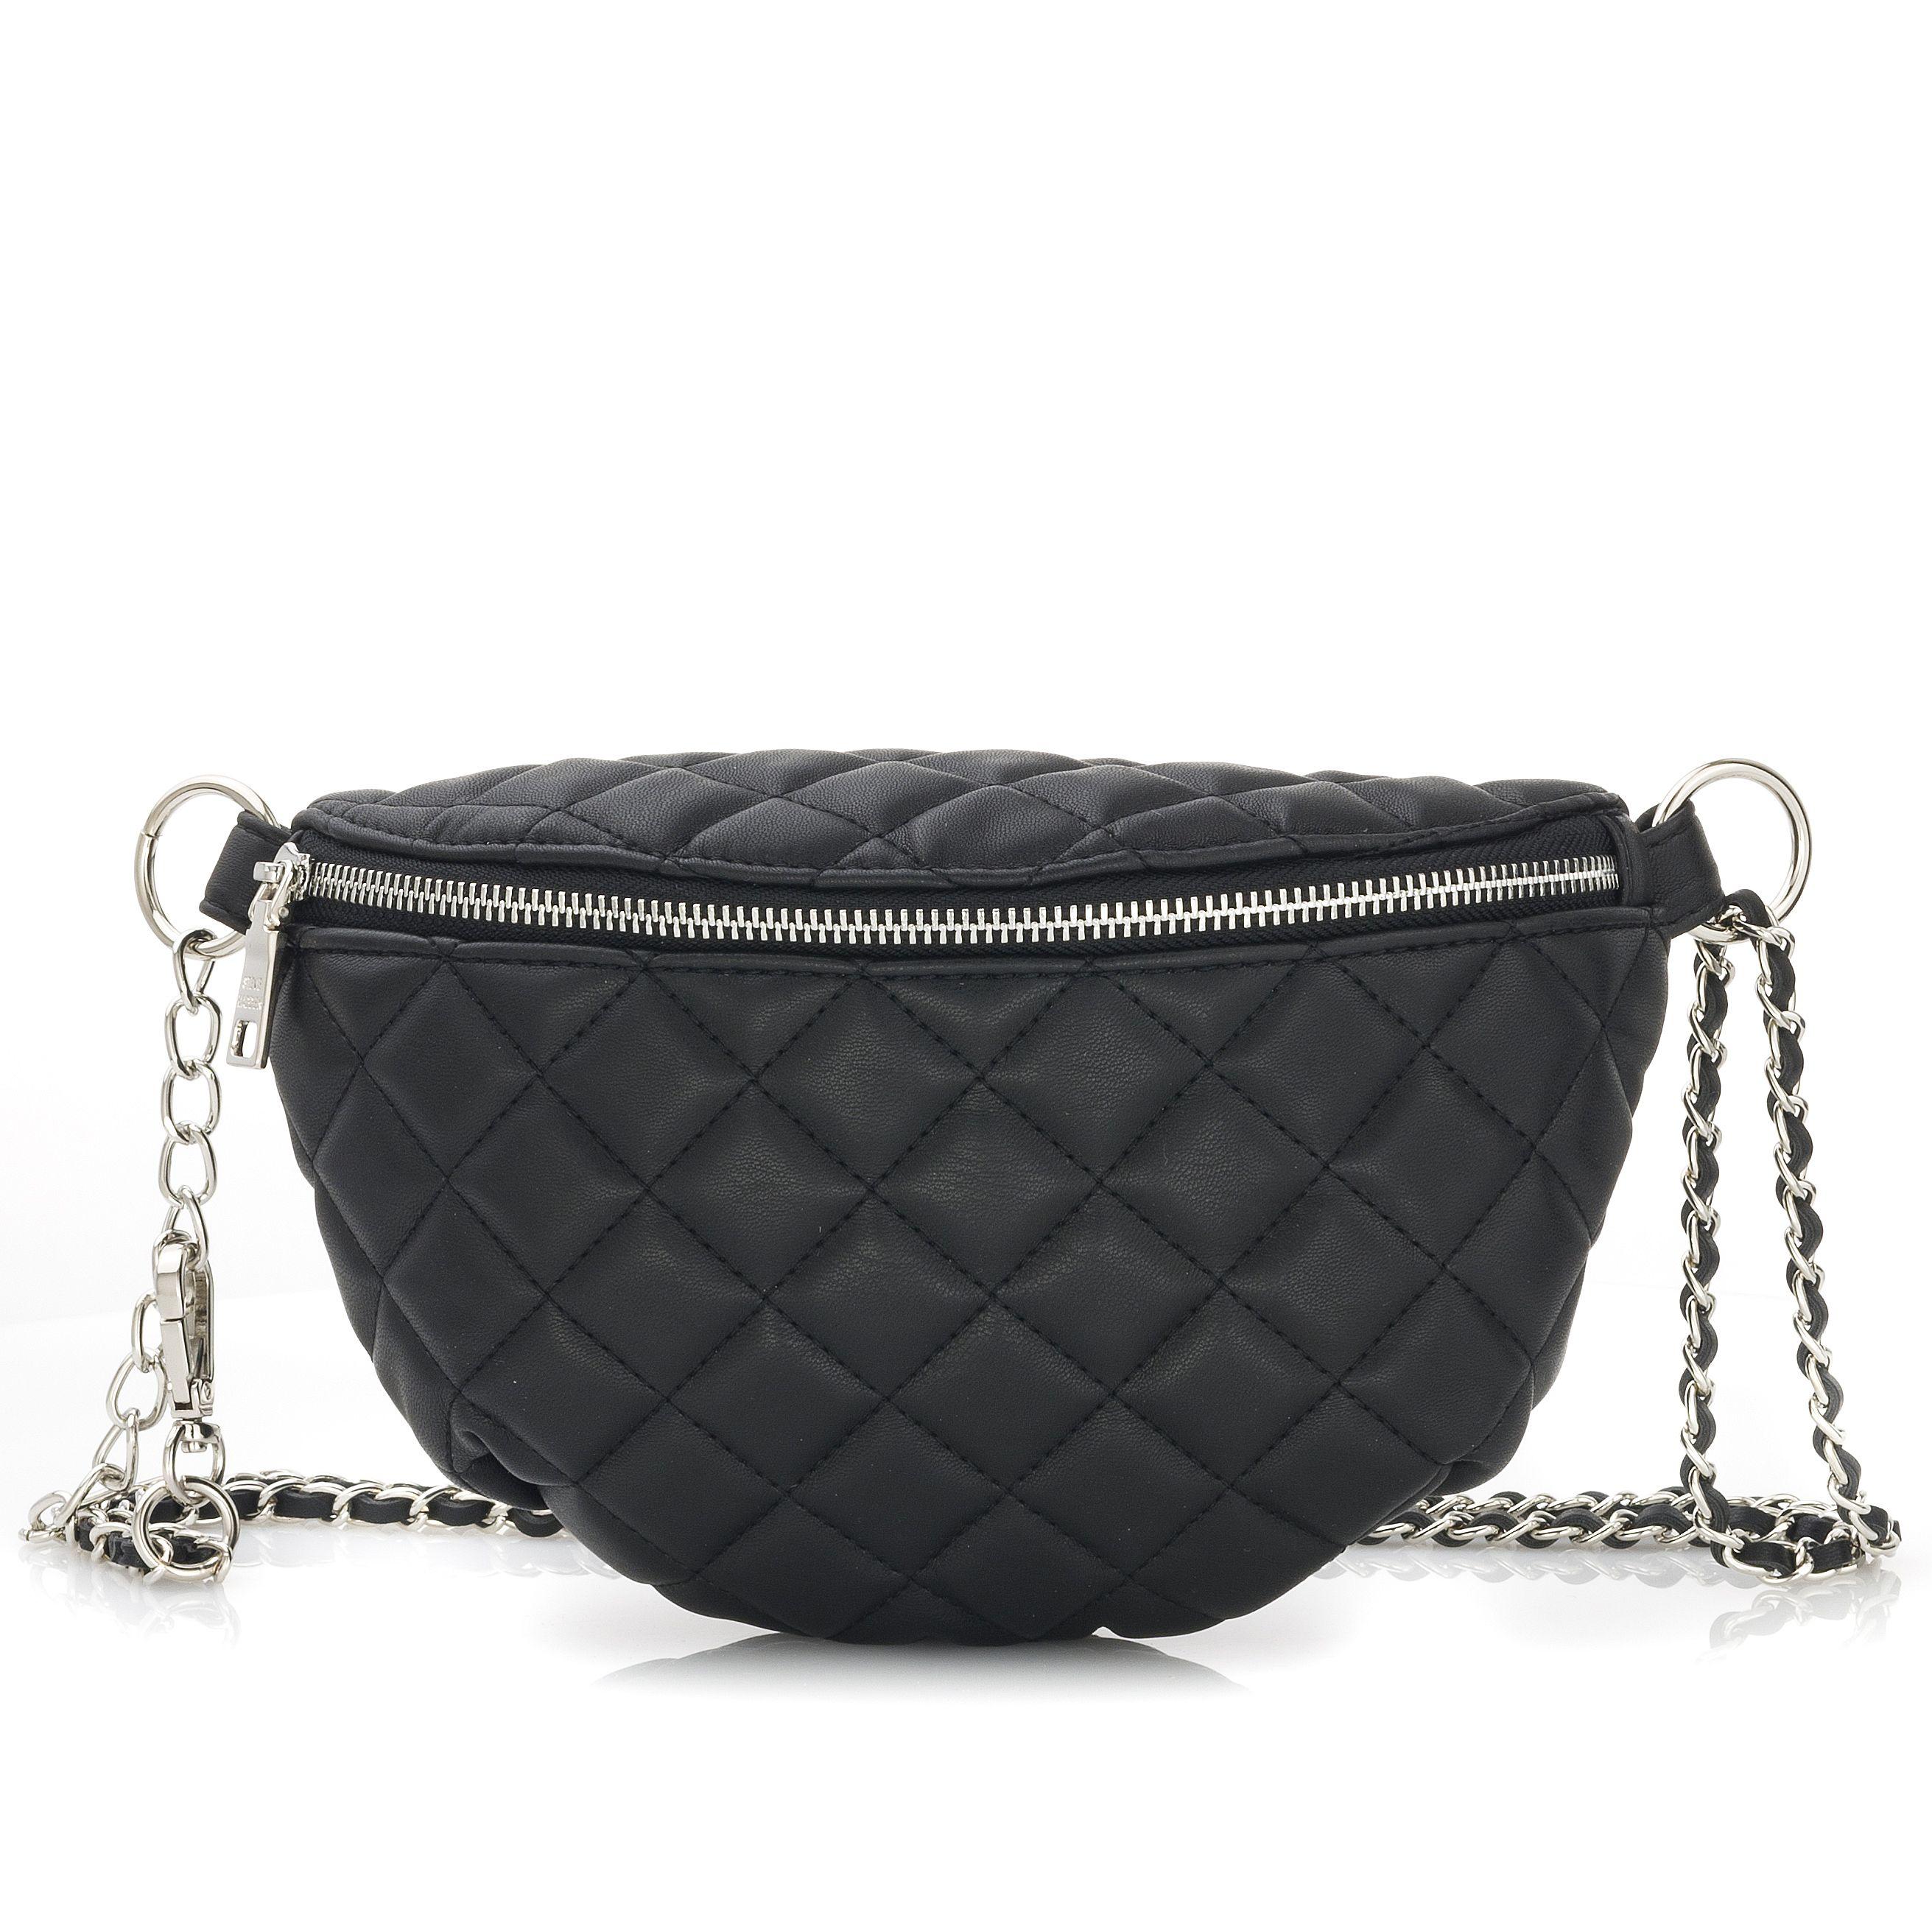 c0475c353d9 Steve Madden Belt Bag - BMANDIE Black